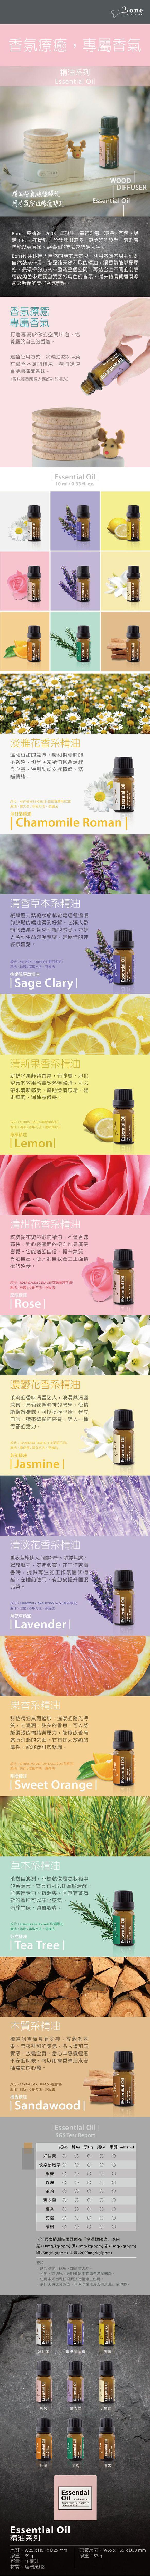 Bone|Essential Oil - Lavender 薰衣草精油 10ml